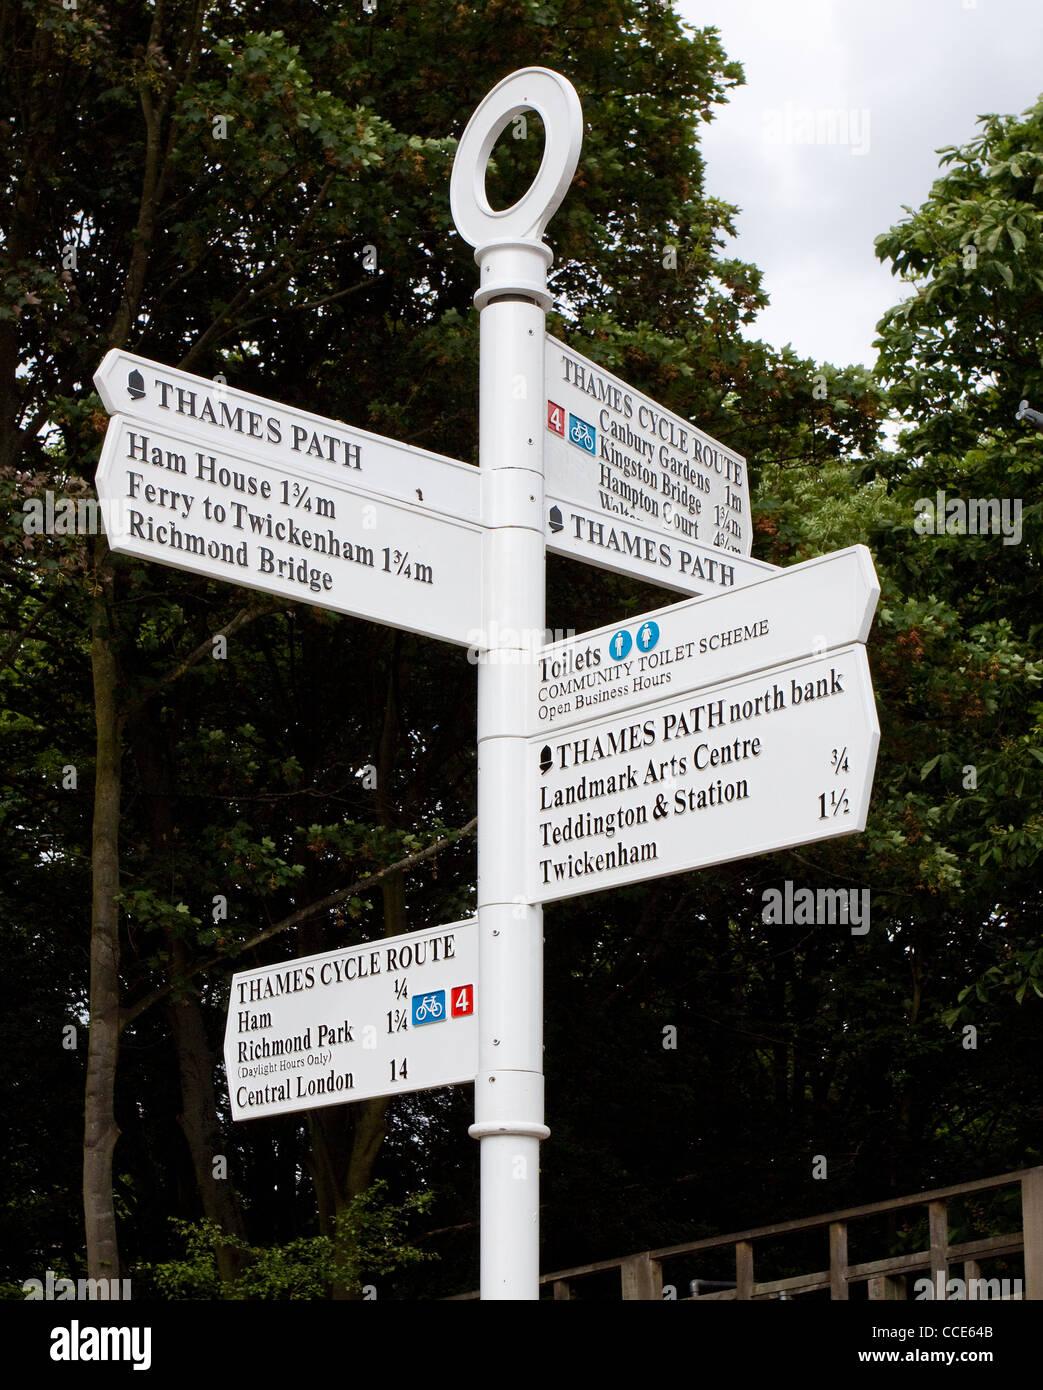 Thames Path Sign. Teddington Lock, River Thames, London, UK Stock Photo